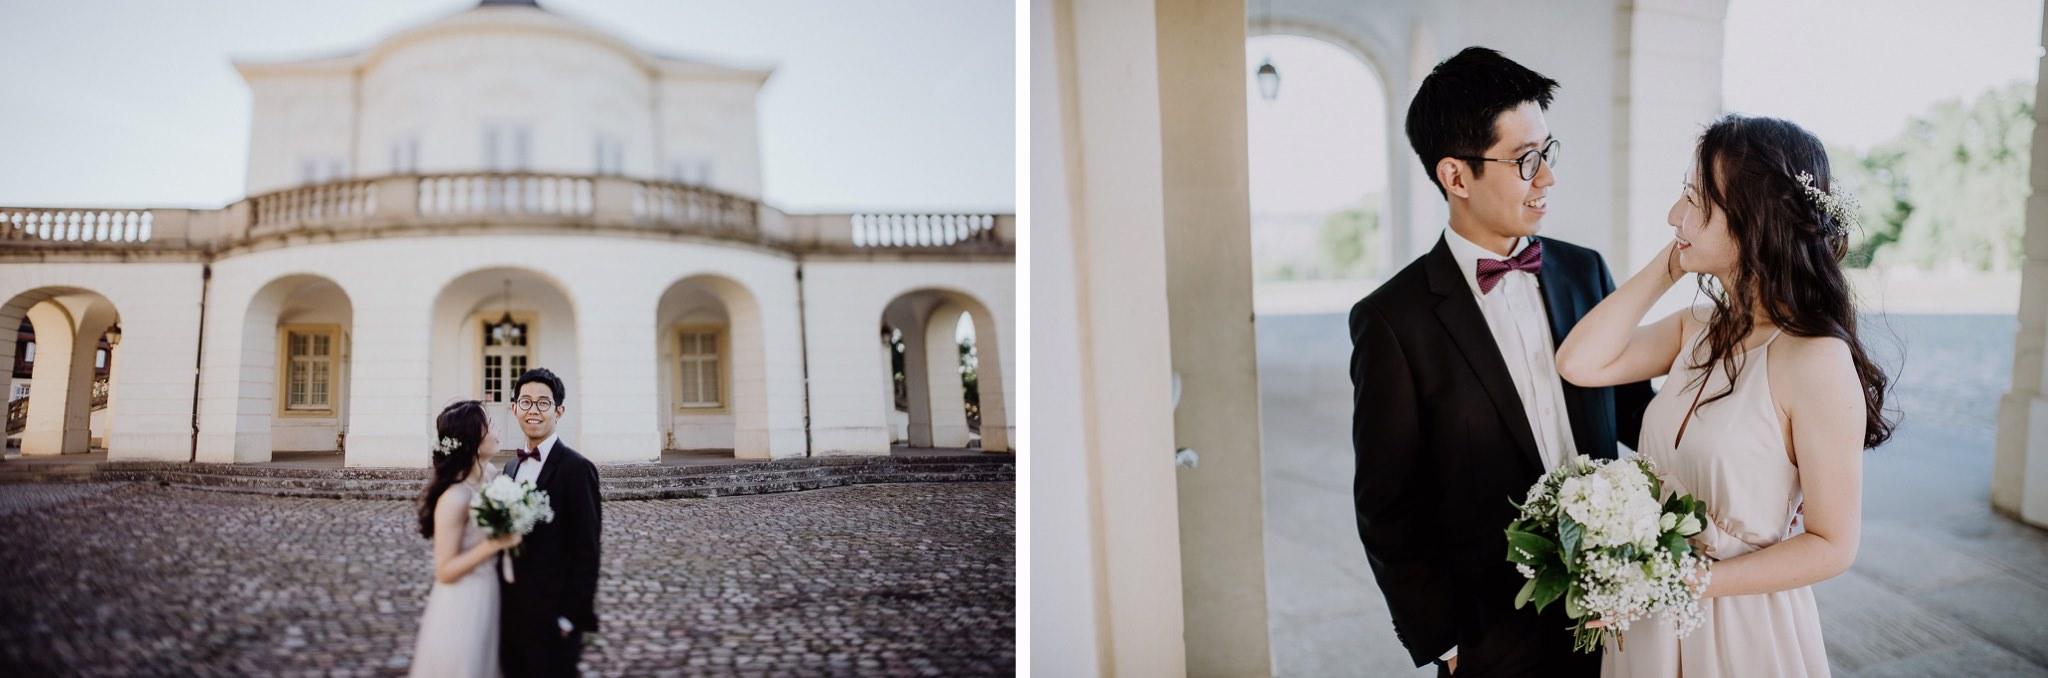 wedding photographer hamilton new zealand 1003 6